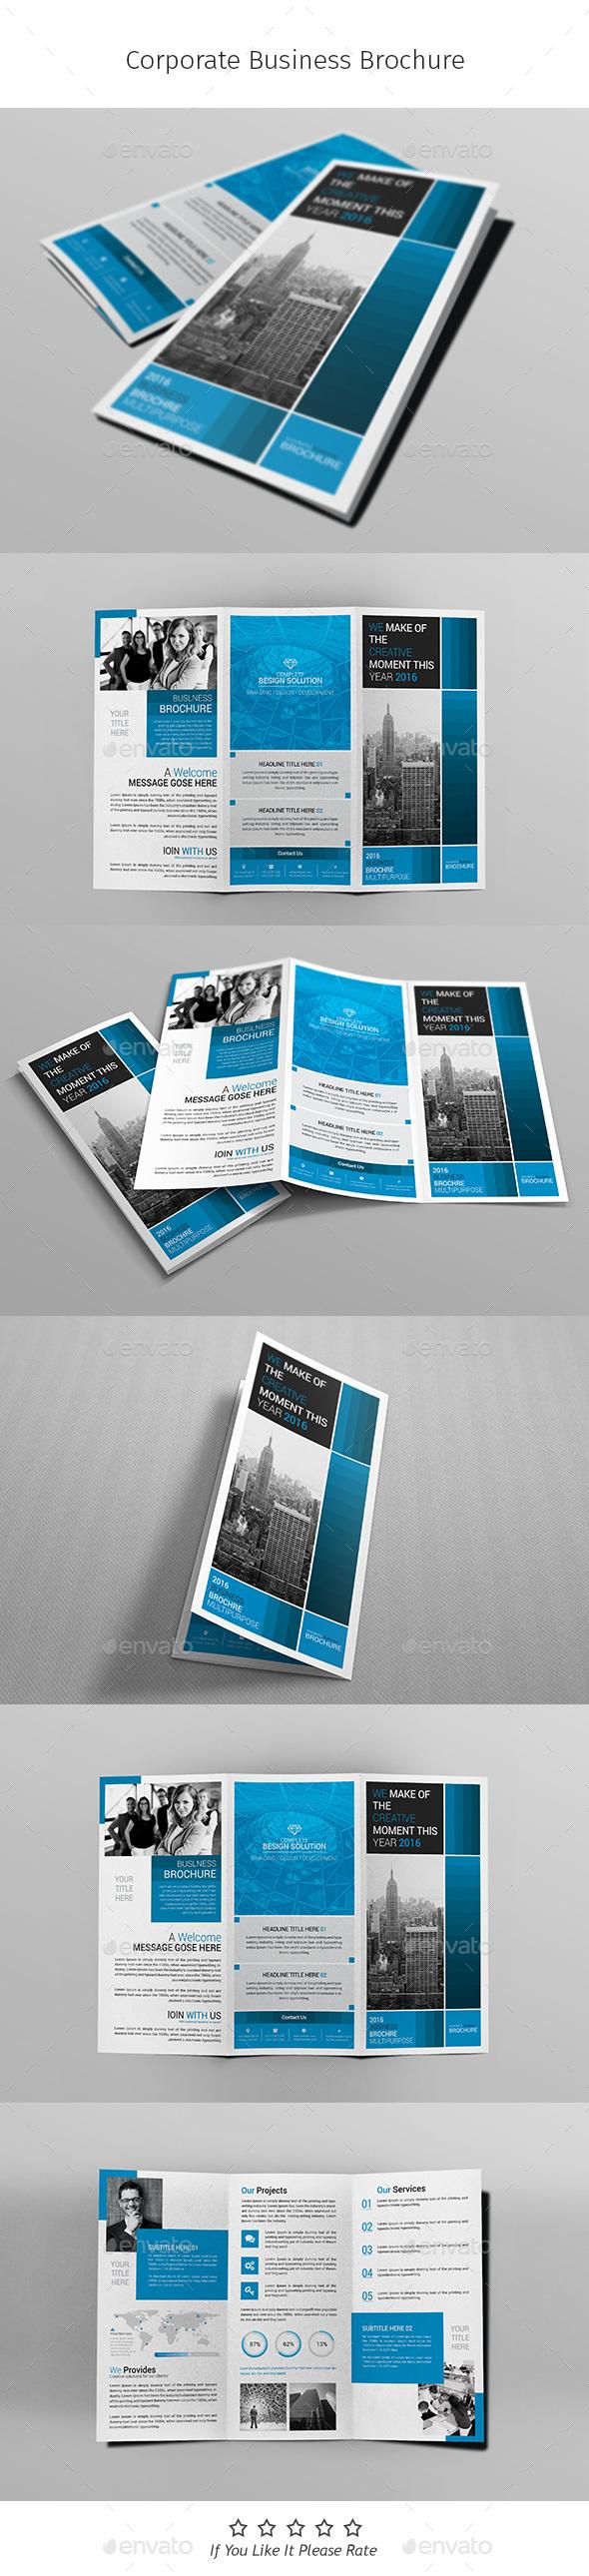 A4 Corporate Business Flyer Template Vol 06 - Corporate Brochures